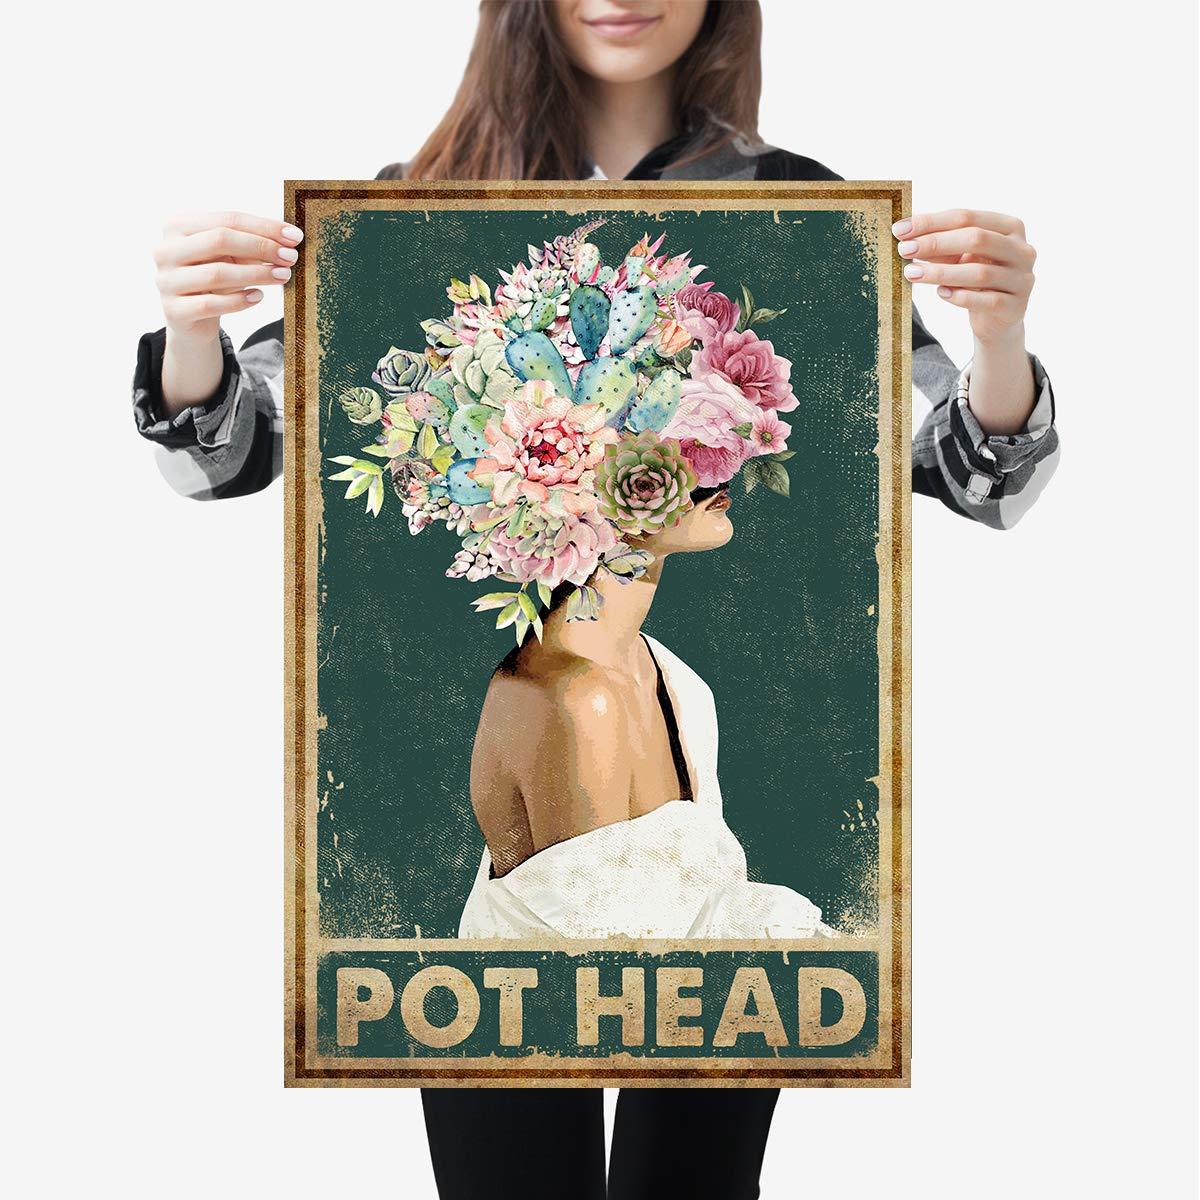 Pot Head Gardening Girl Flower Plant Lovers Gardener Portrait Vertical Poster Print Wall Art Hanging Home Decor Office Decorations